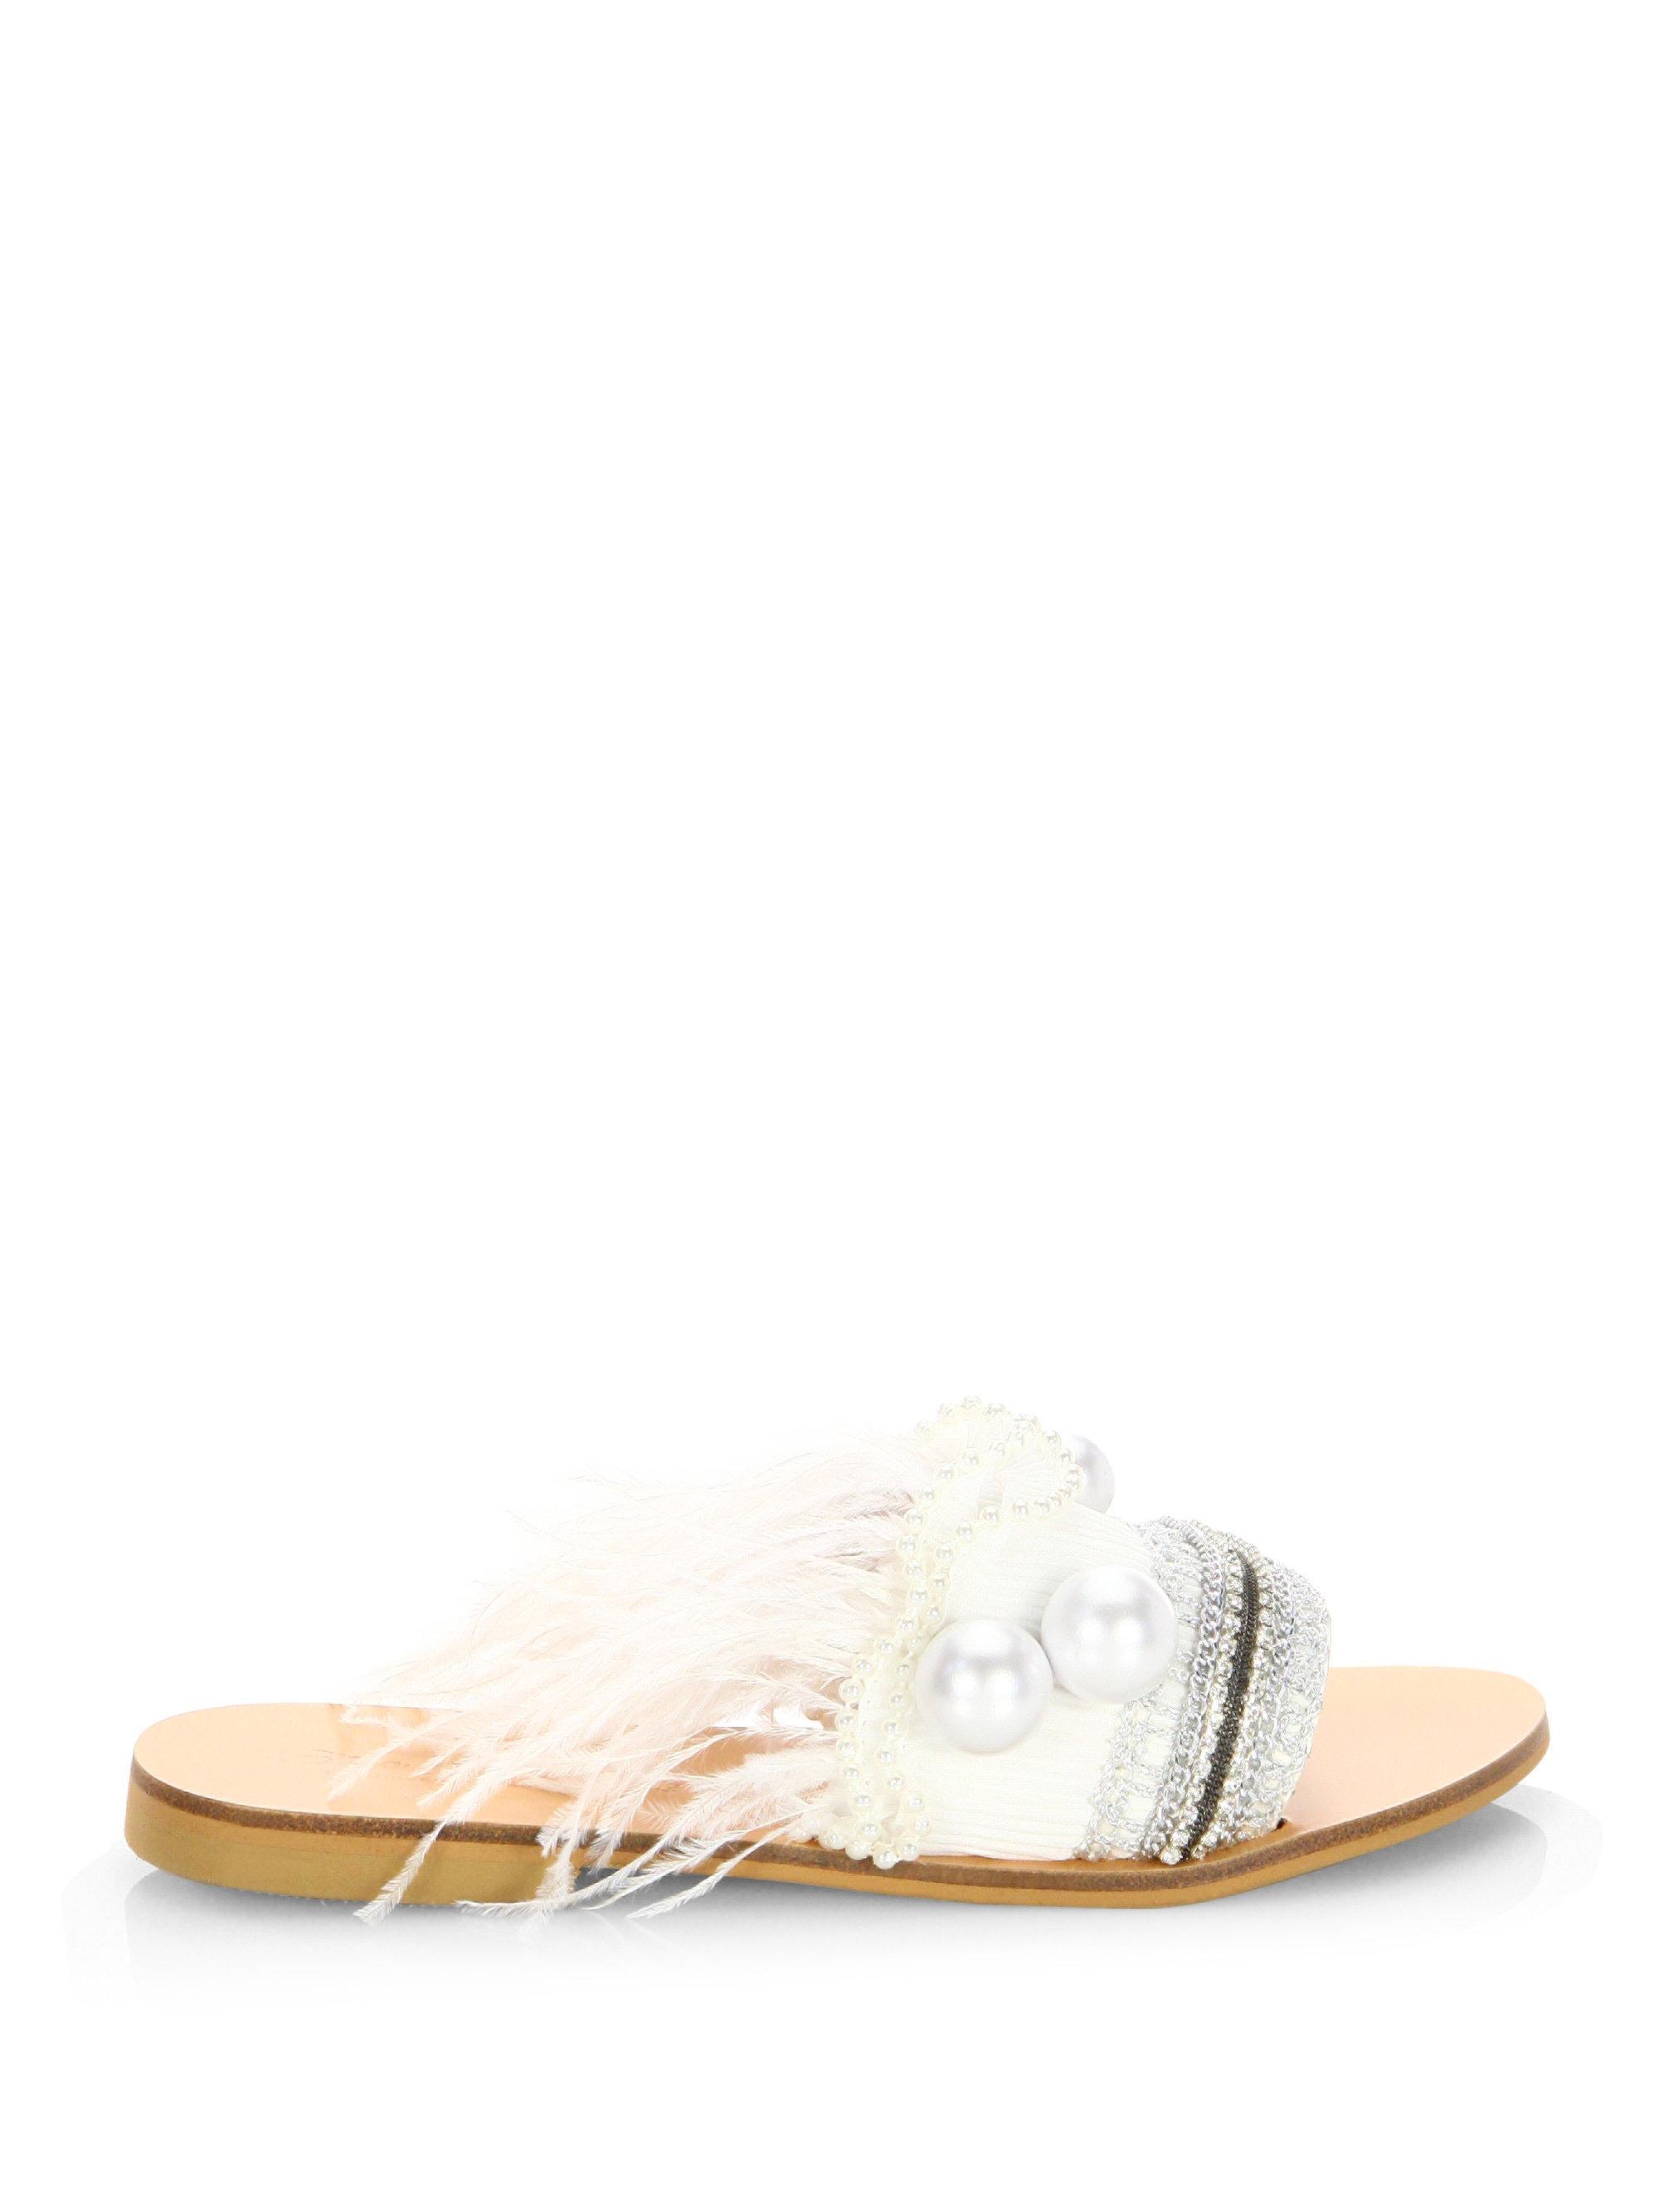 Elina Linardaki Mon Cherie Leather Sandals 5vINtD